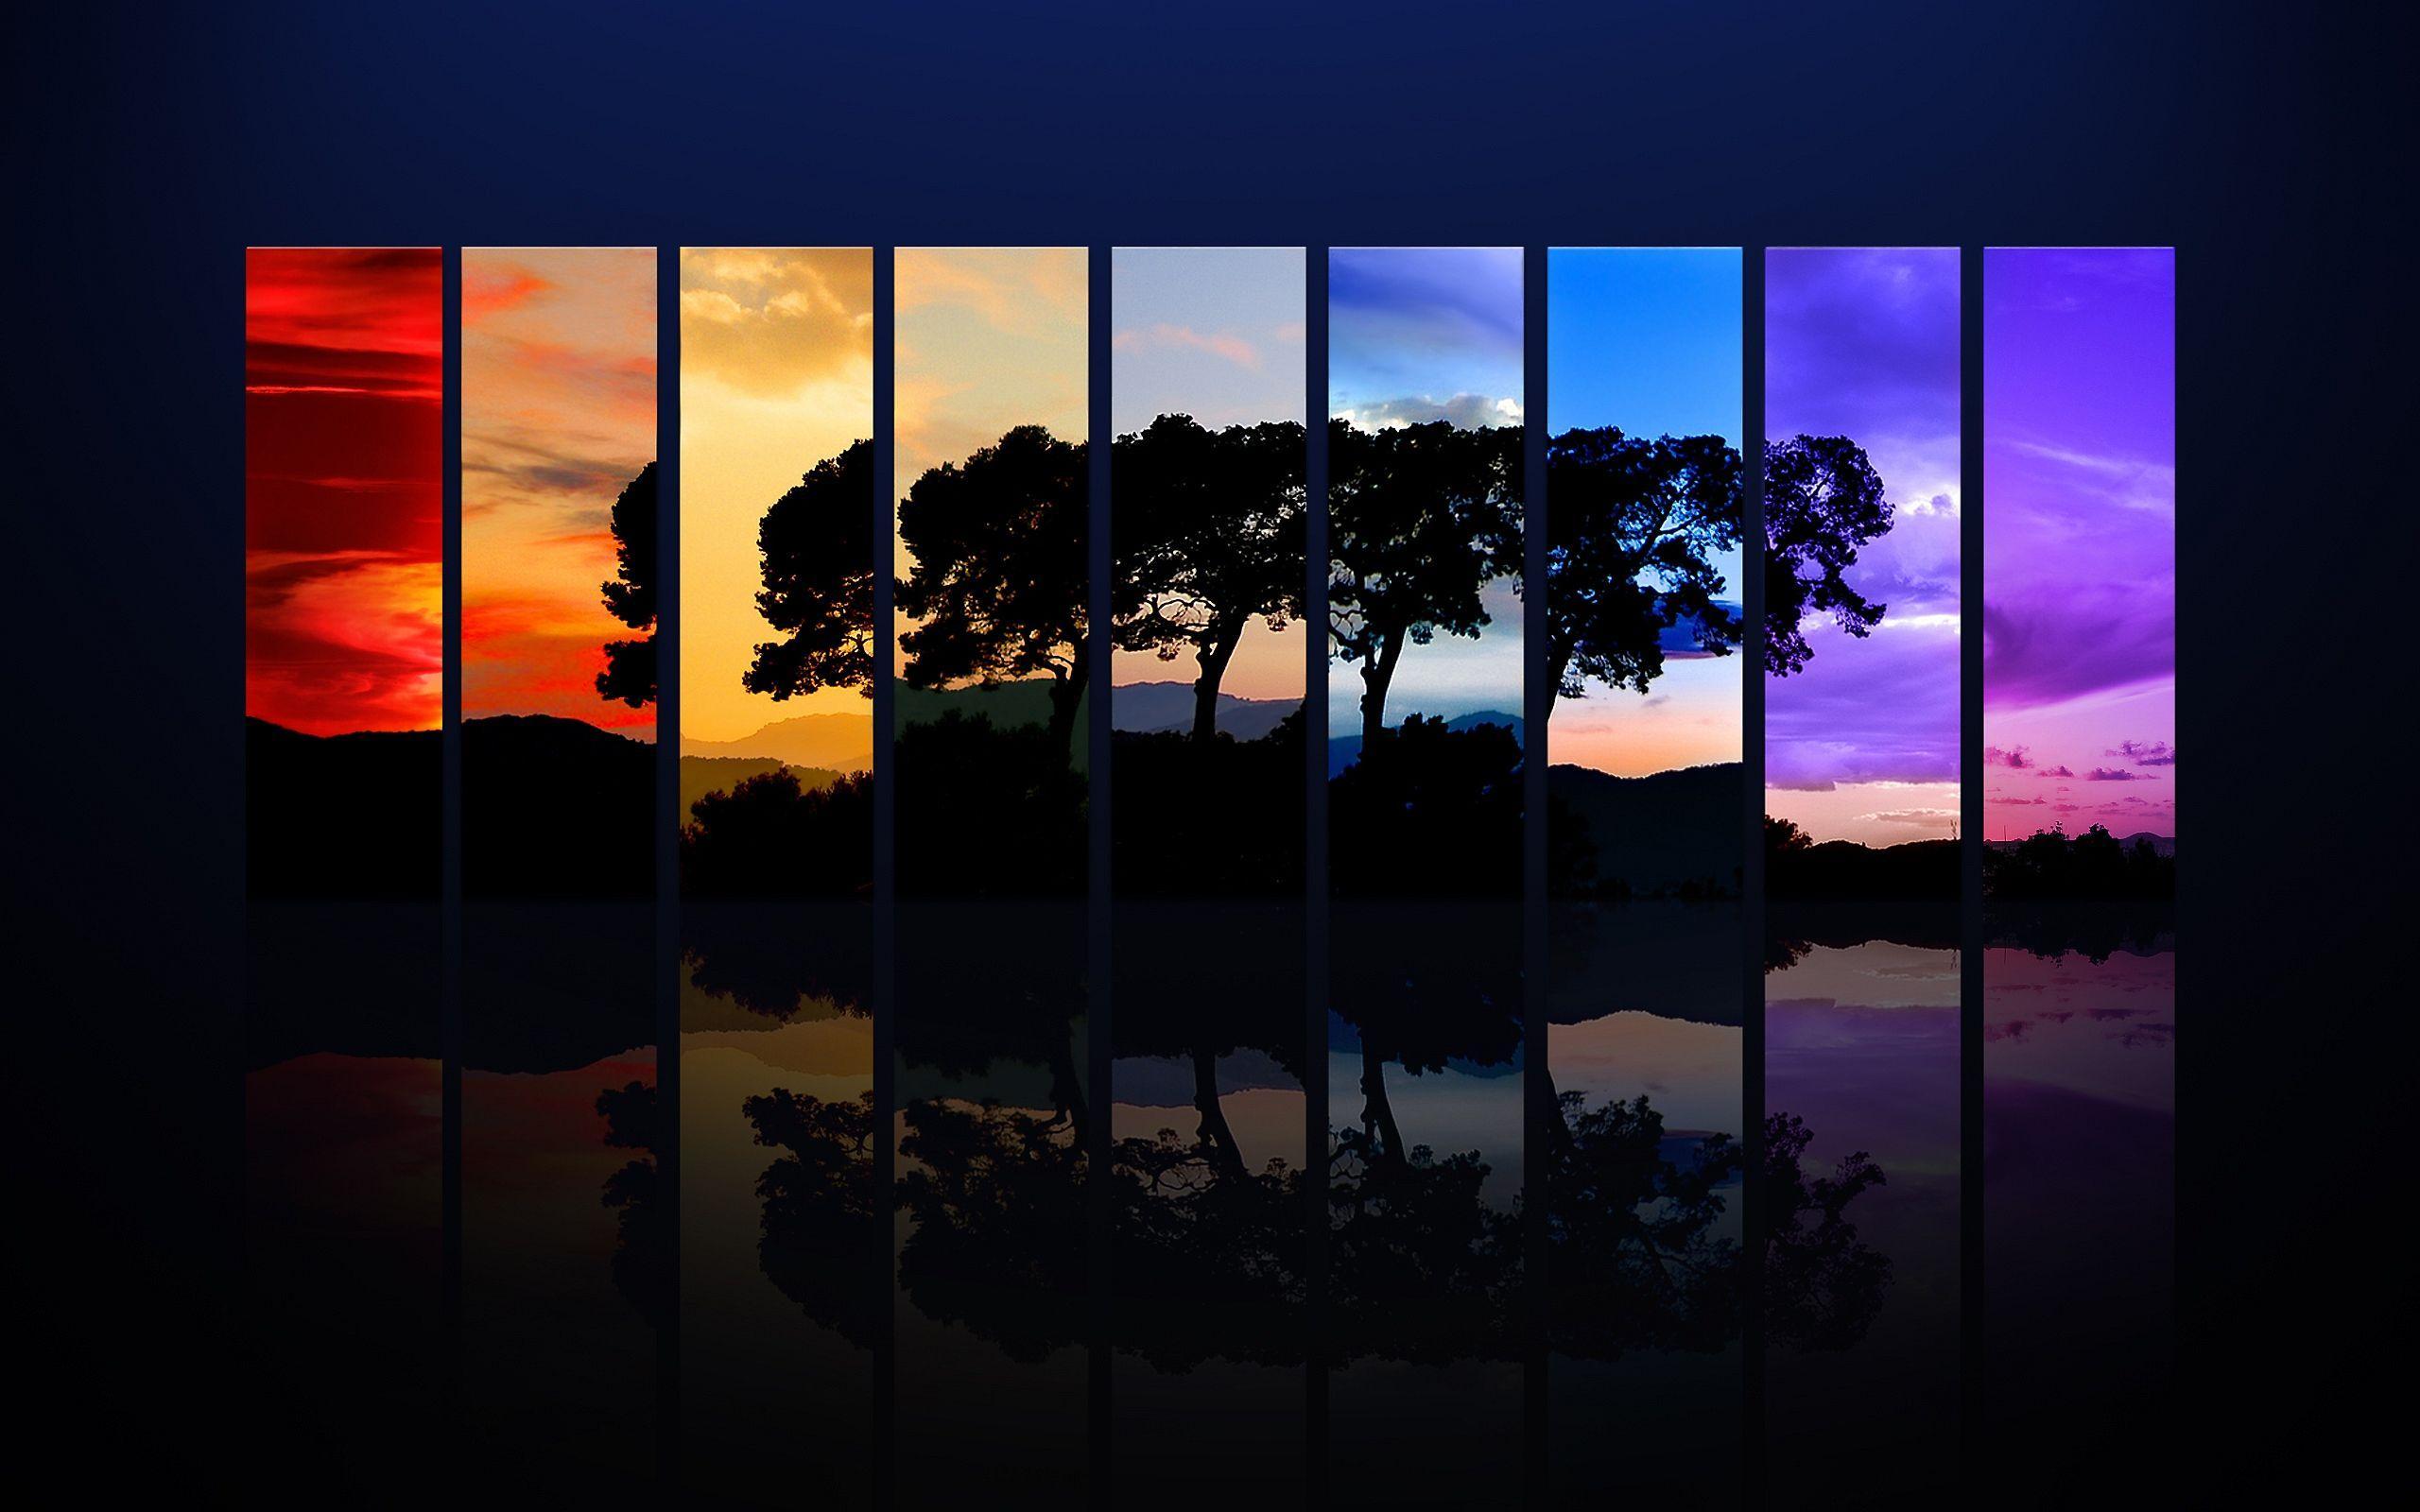 How To Get Cool Desktop Backgrounds